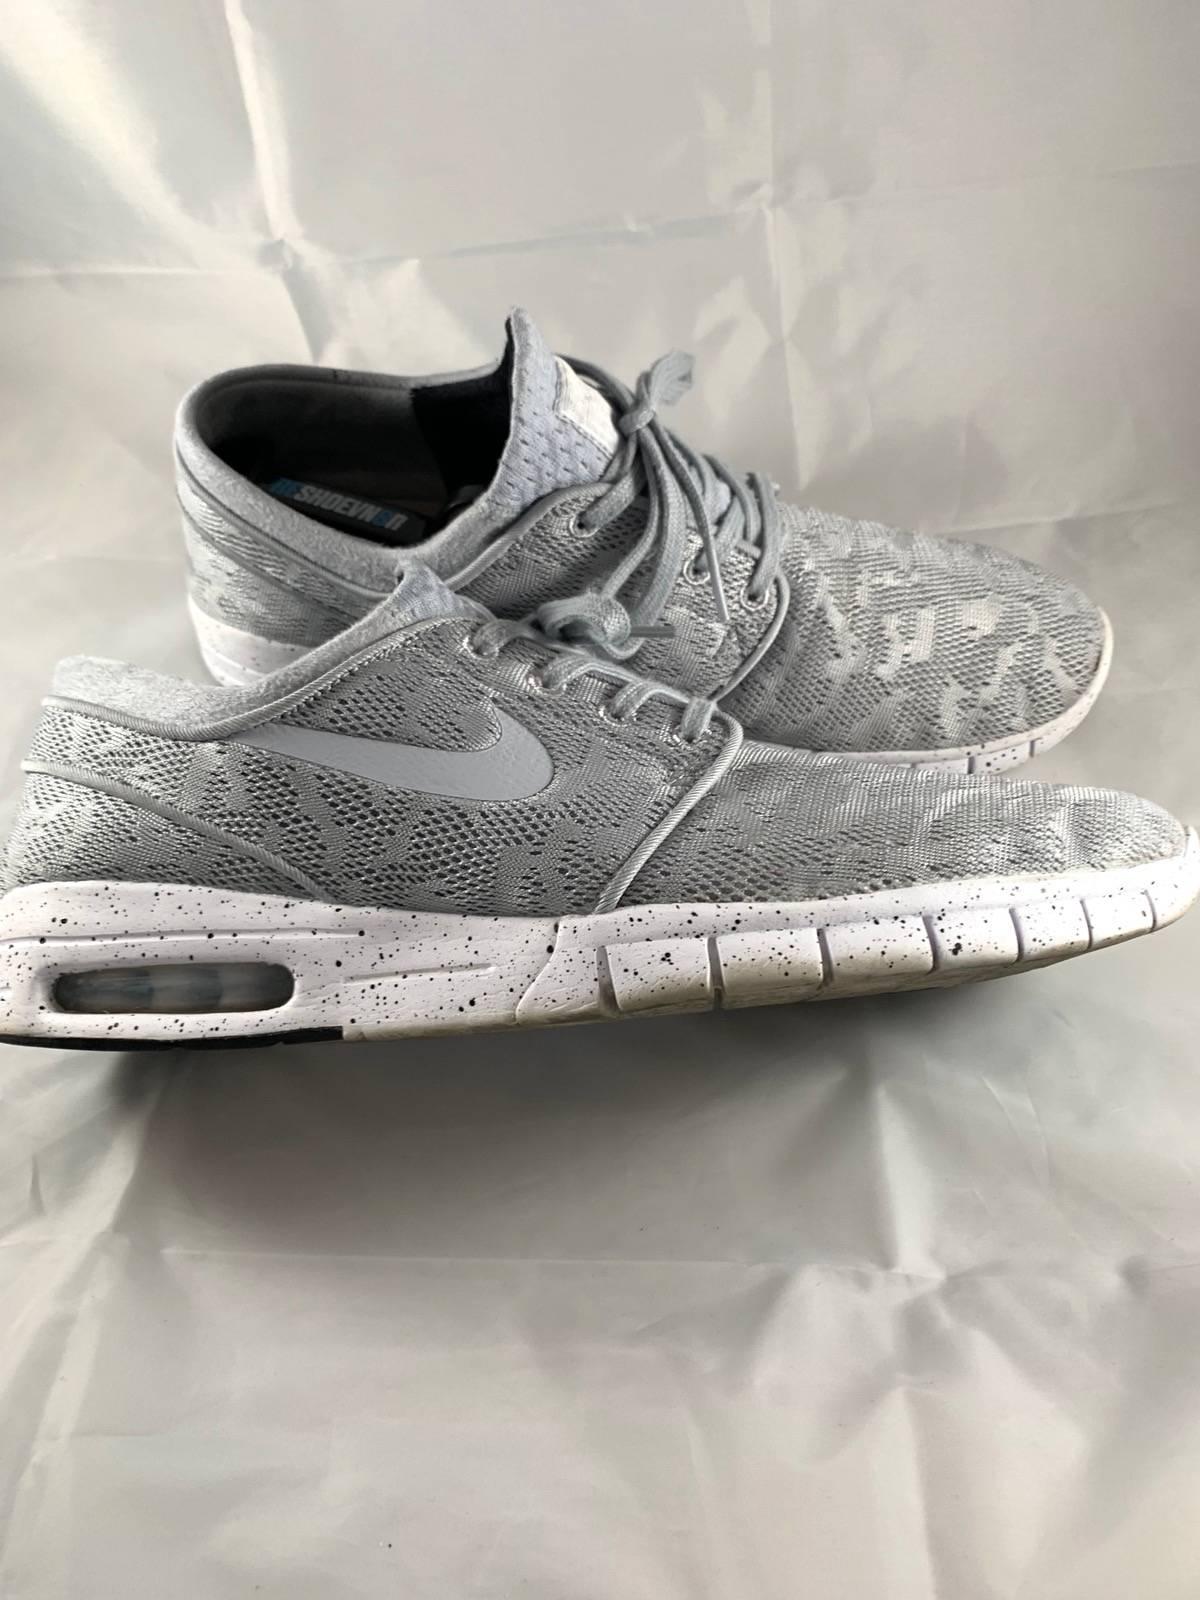 4467effc5a Nike Nike Sb Stefan Janoski Air Max Grey/white | Grailed